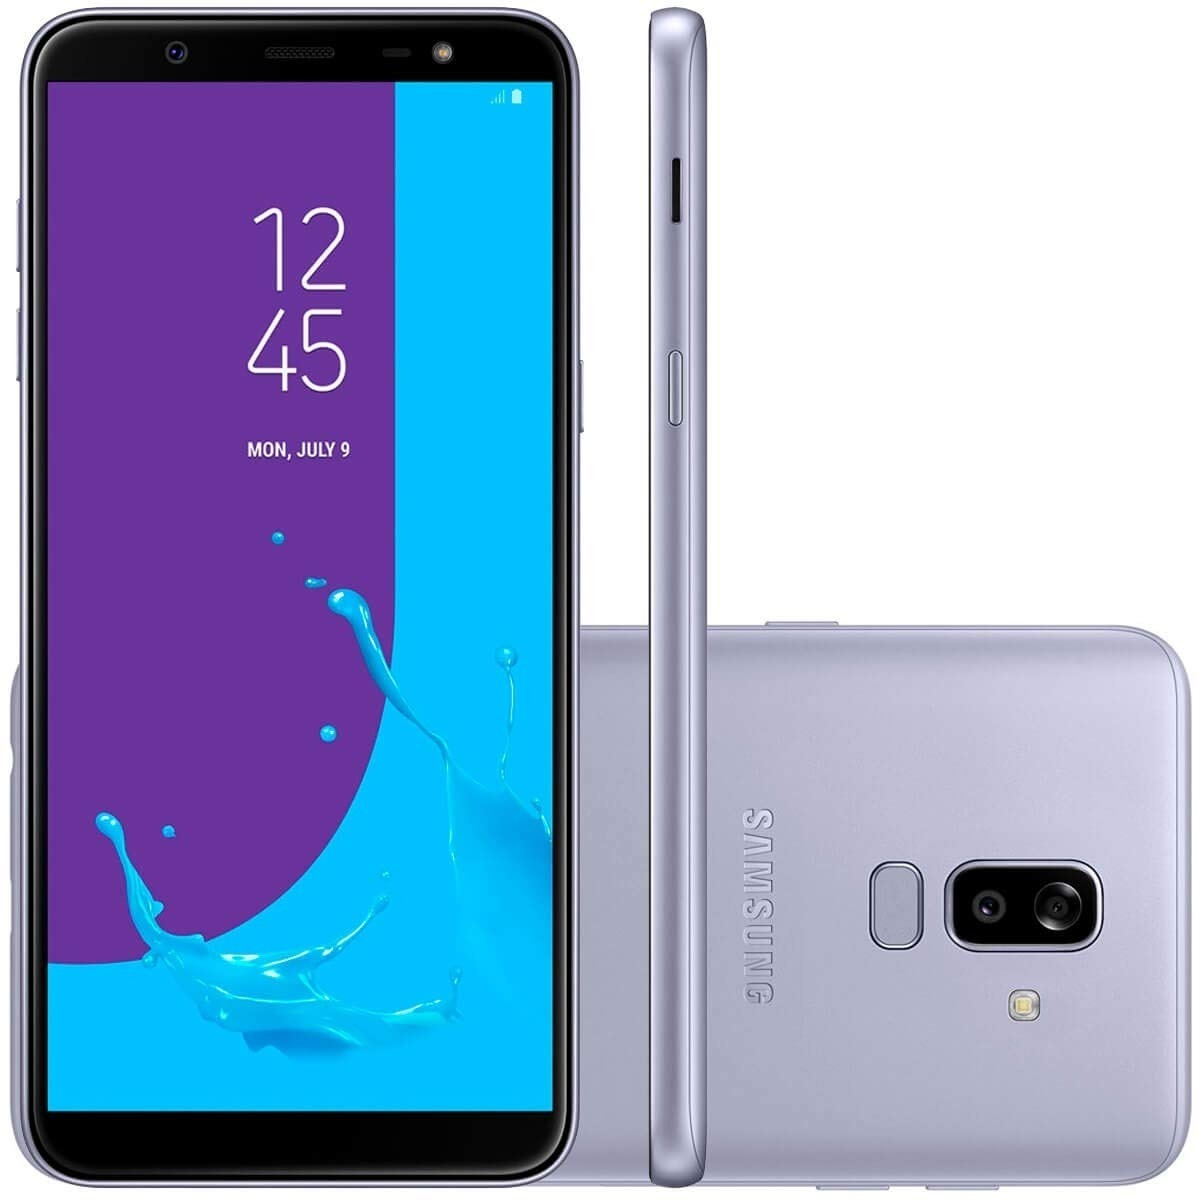 c4dcc4b401 Samsung Galaxy J8 2018 32gb Ram 3gb Libre Fabrica - Sellado - S/ 799 ...